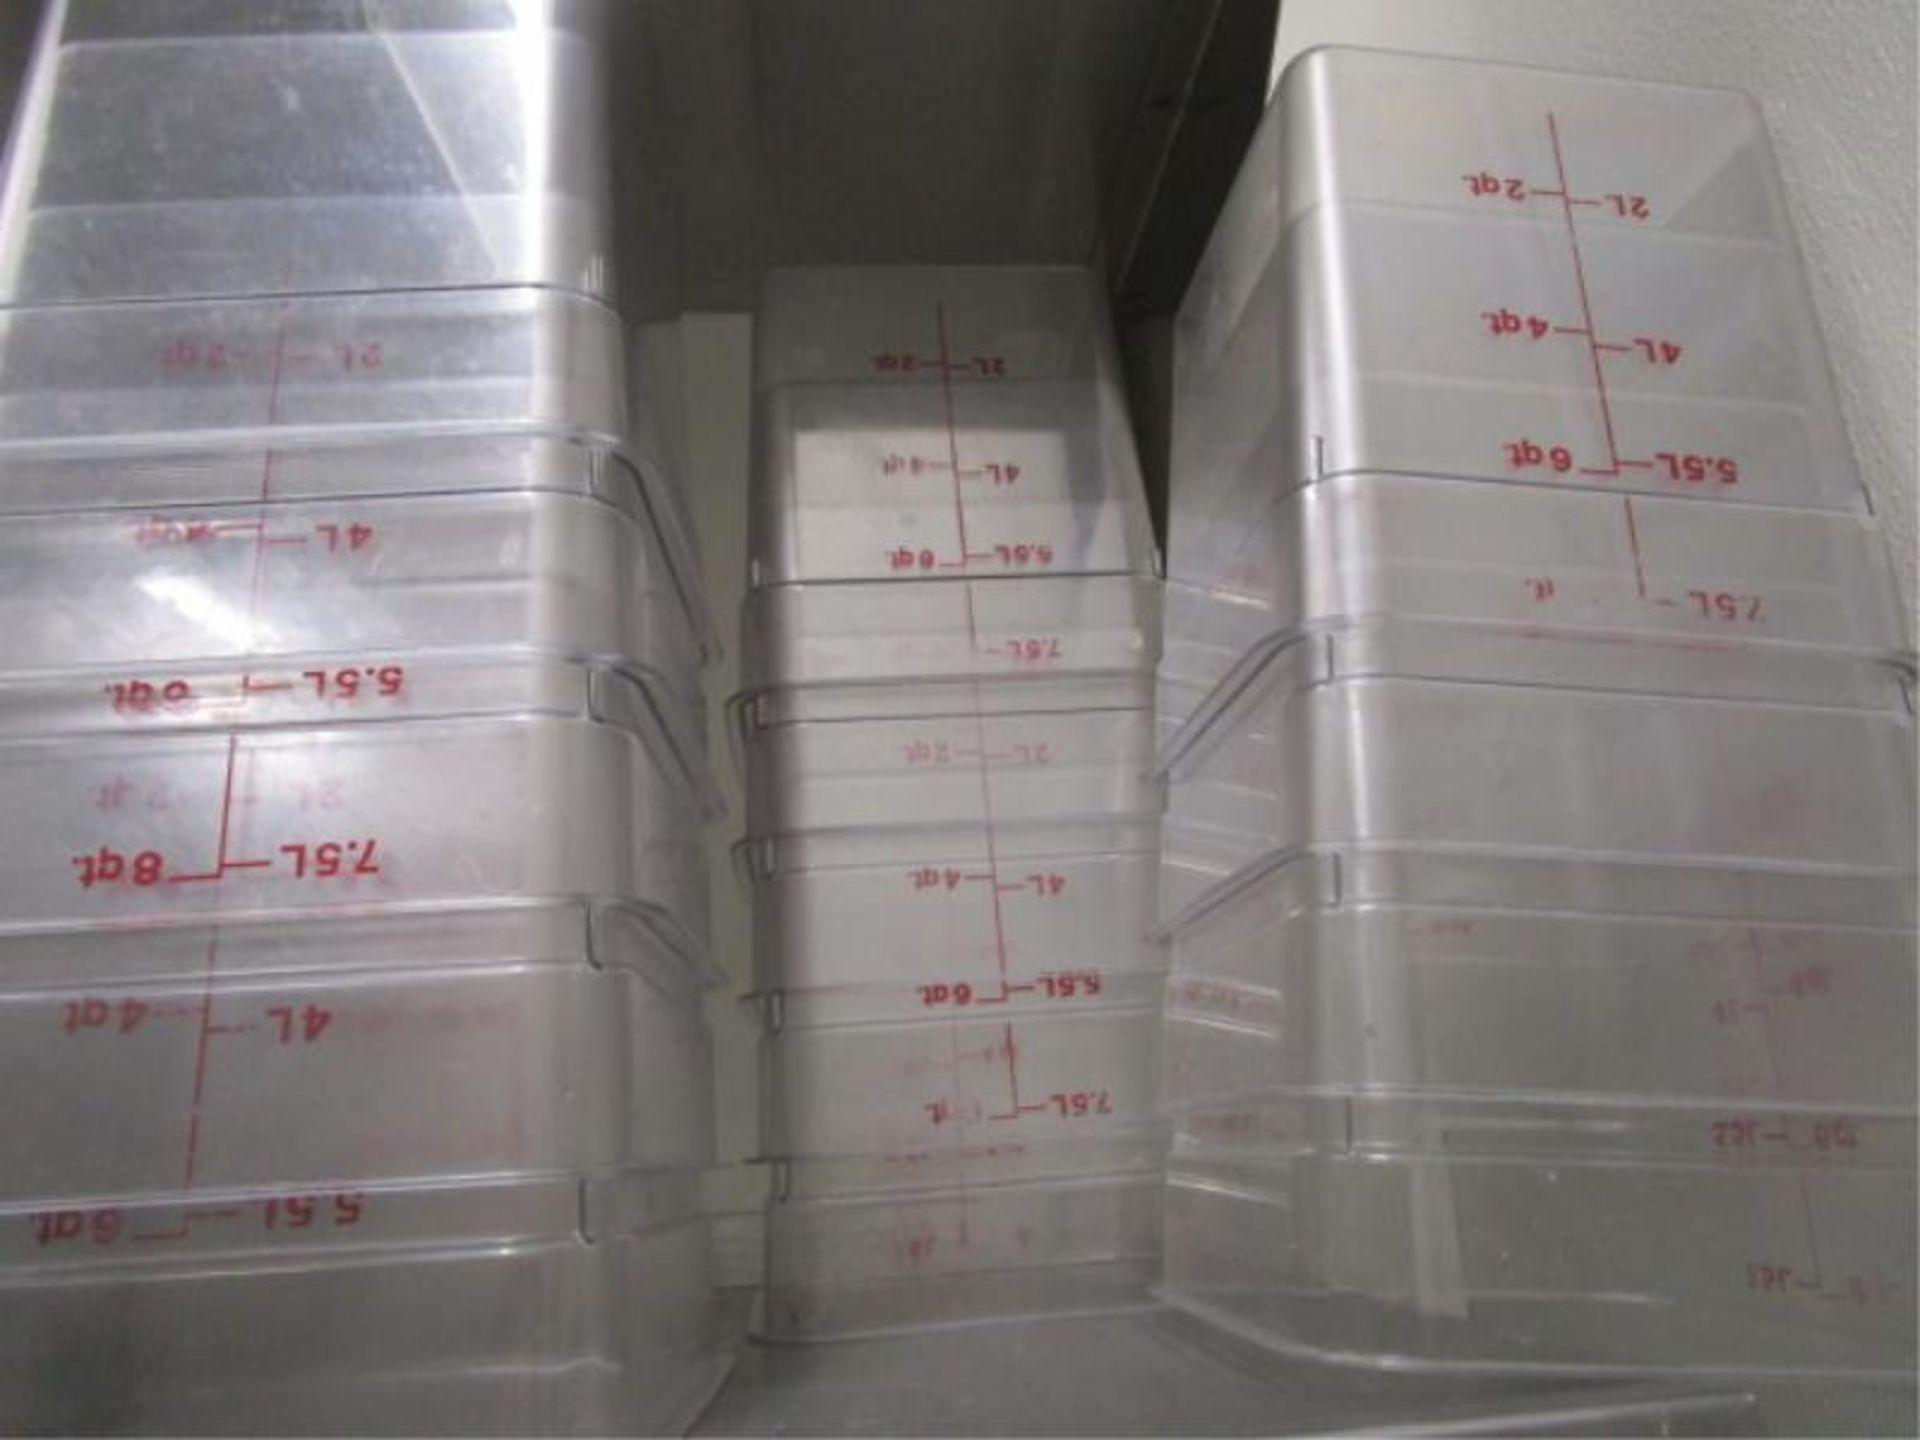 Lot 39 - Lot Clear Plastic Food Containers, 4QT, 6QT & 8QT